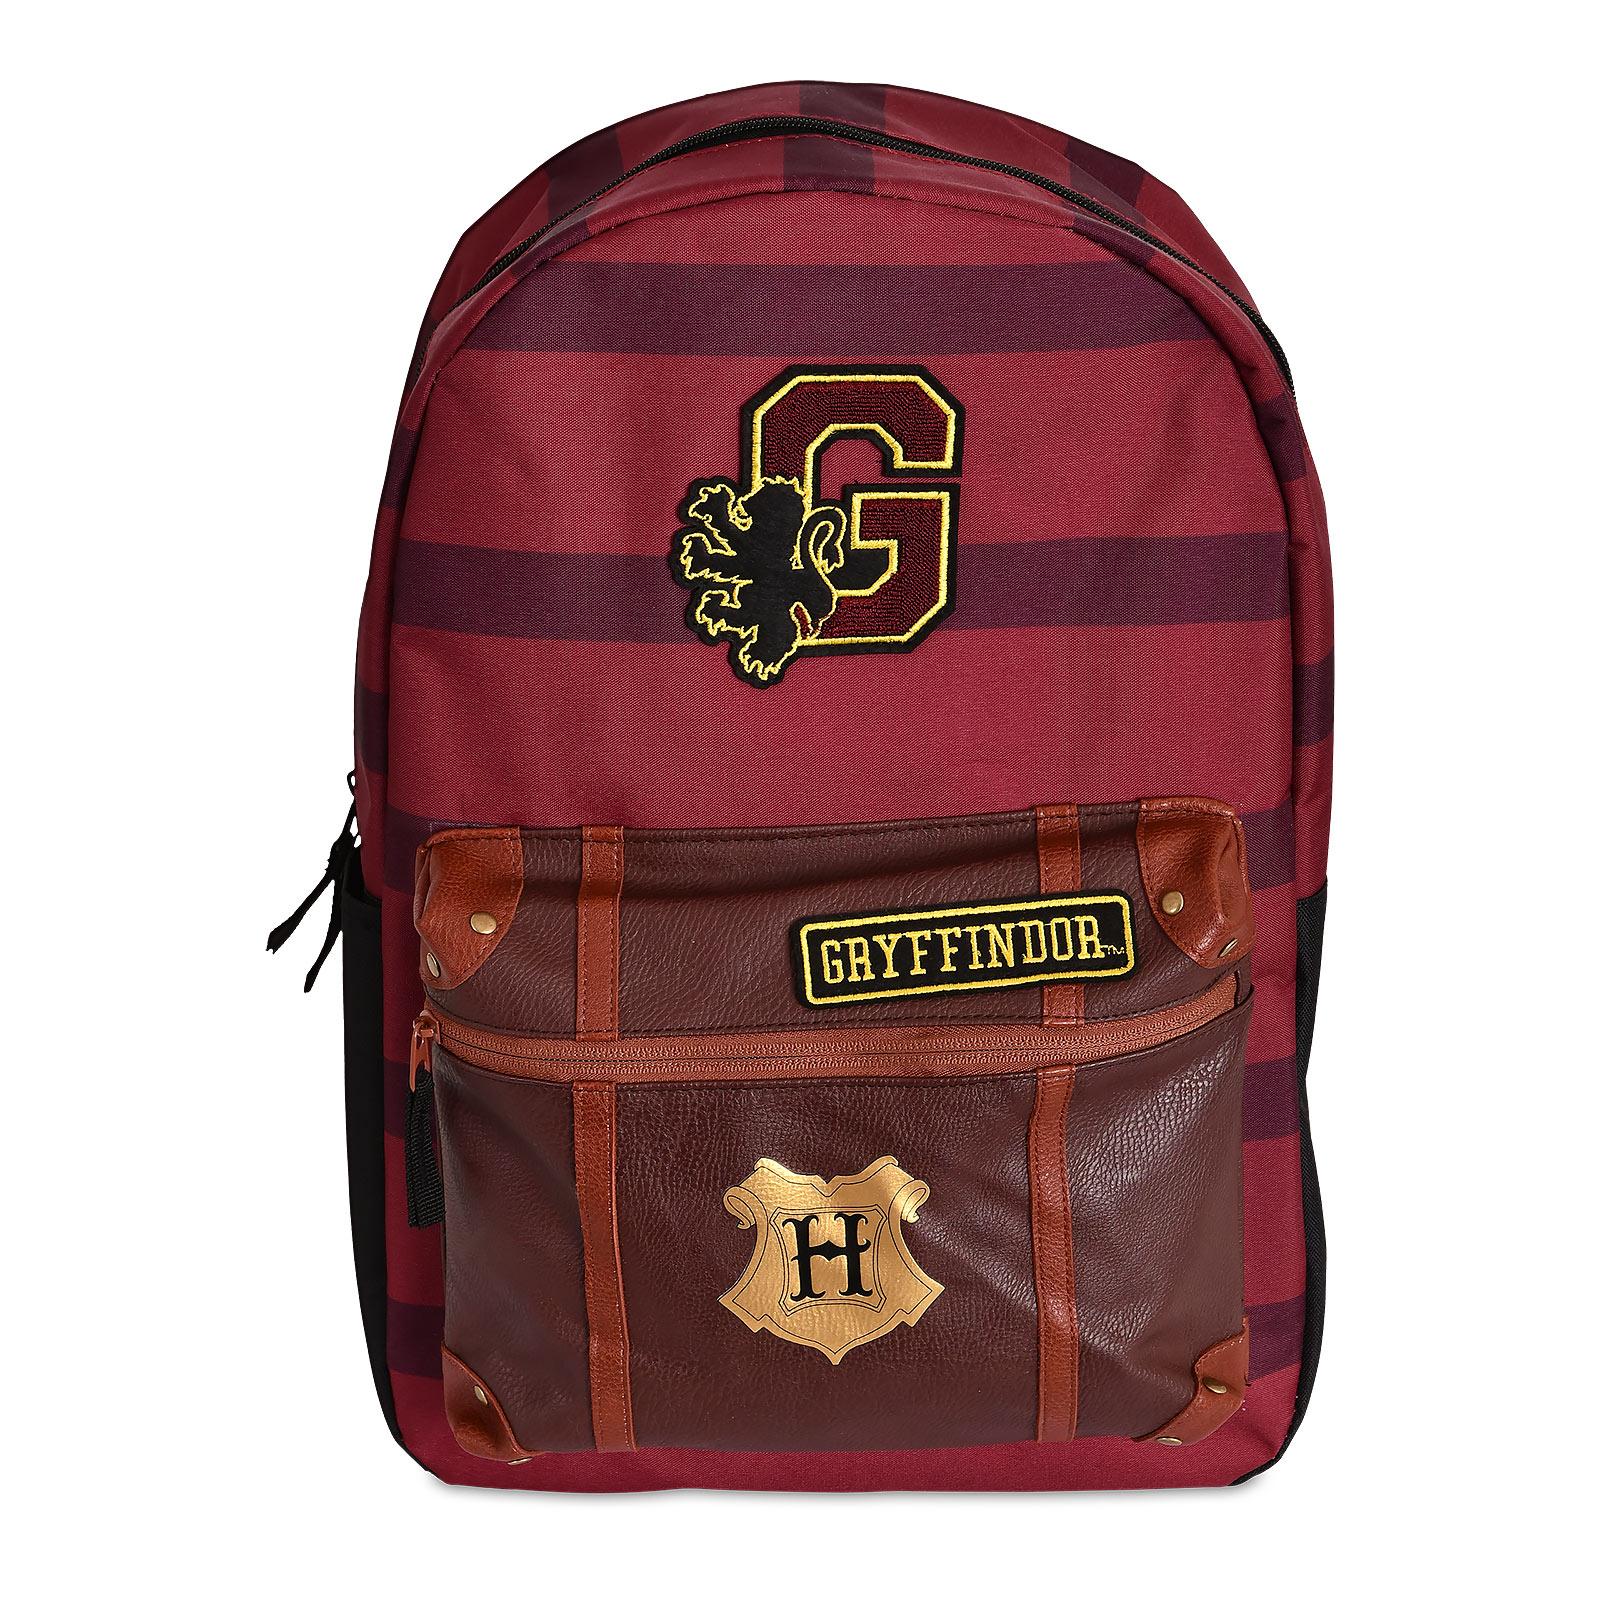 Harry Potter - Gryffindor School Rucksack